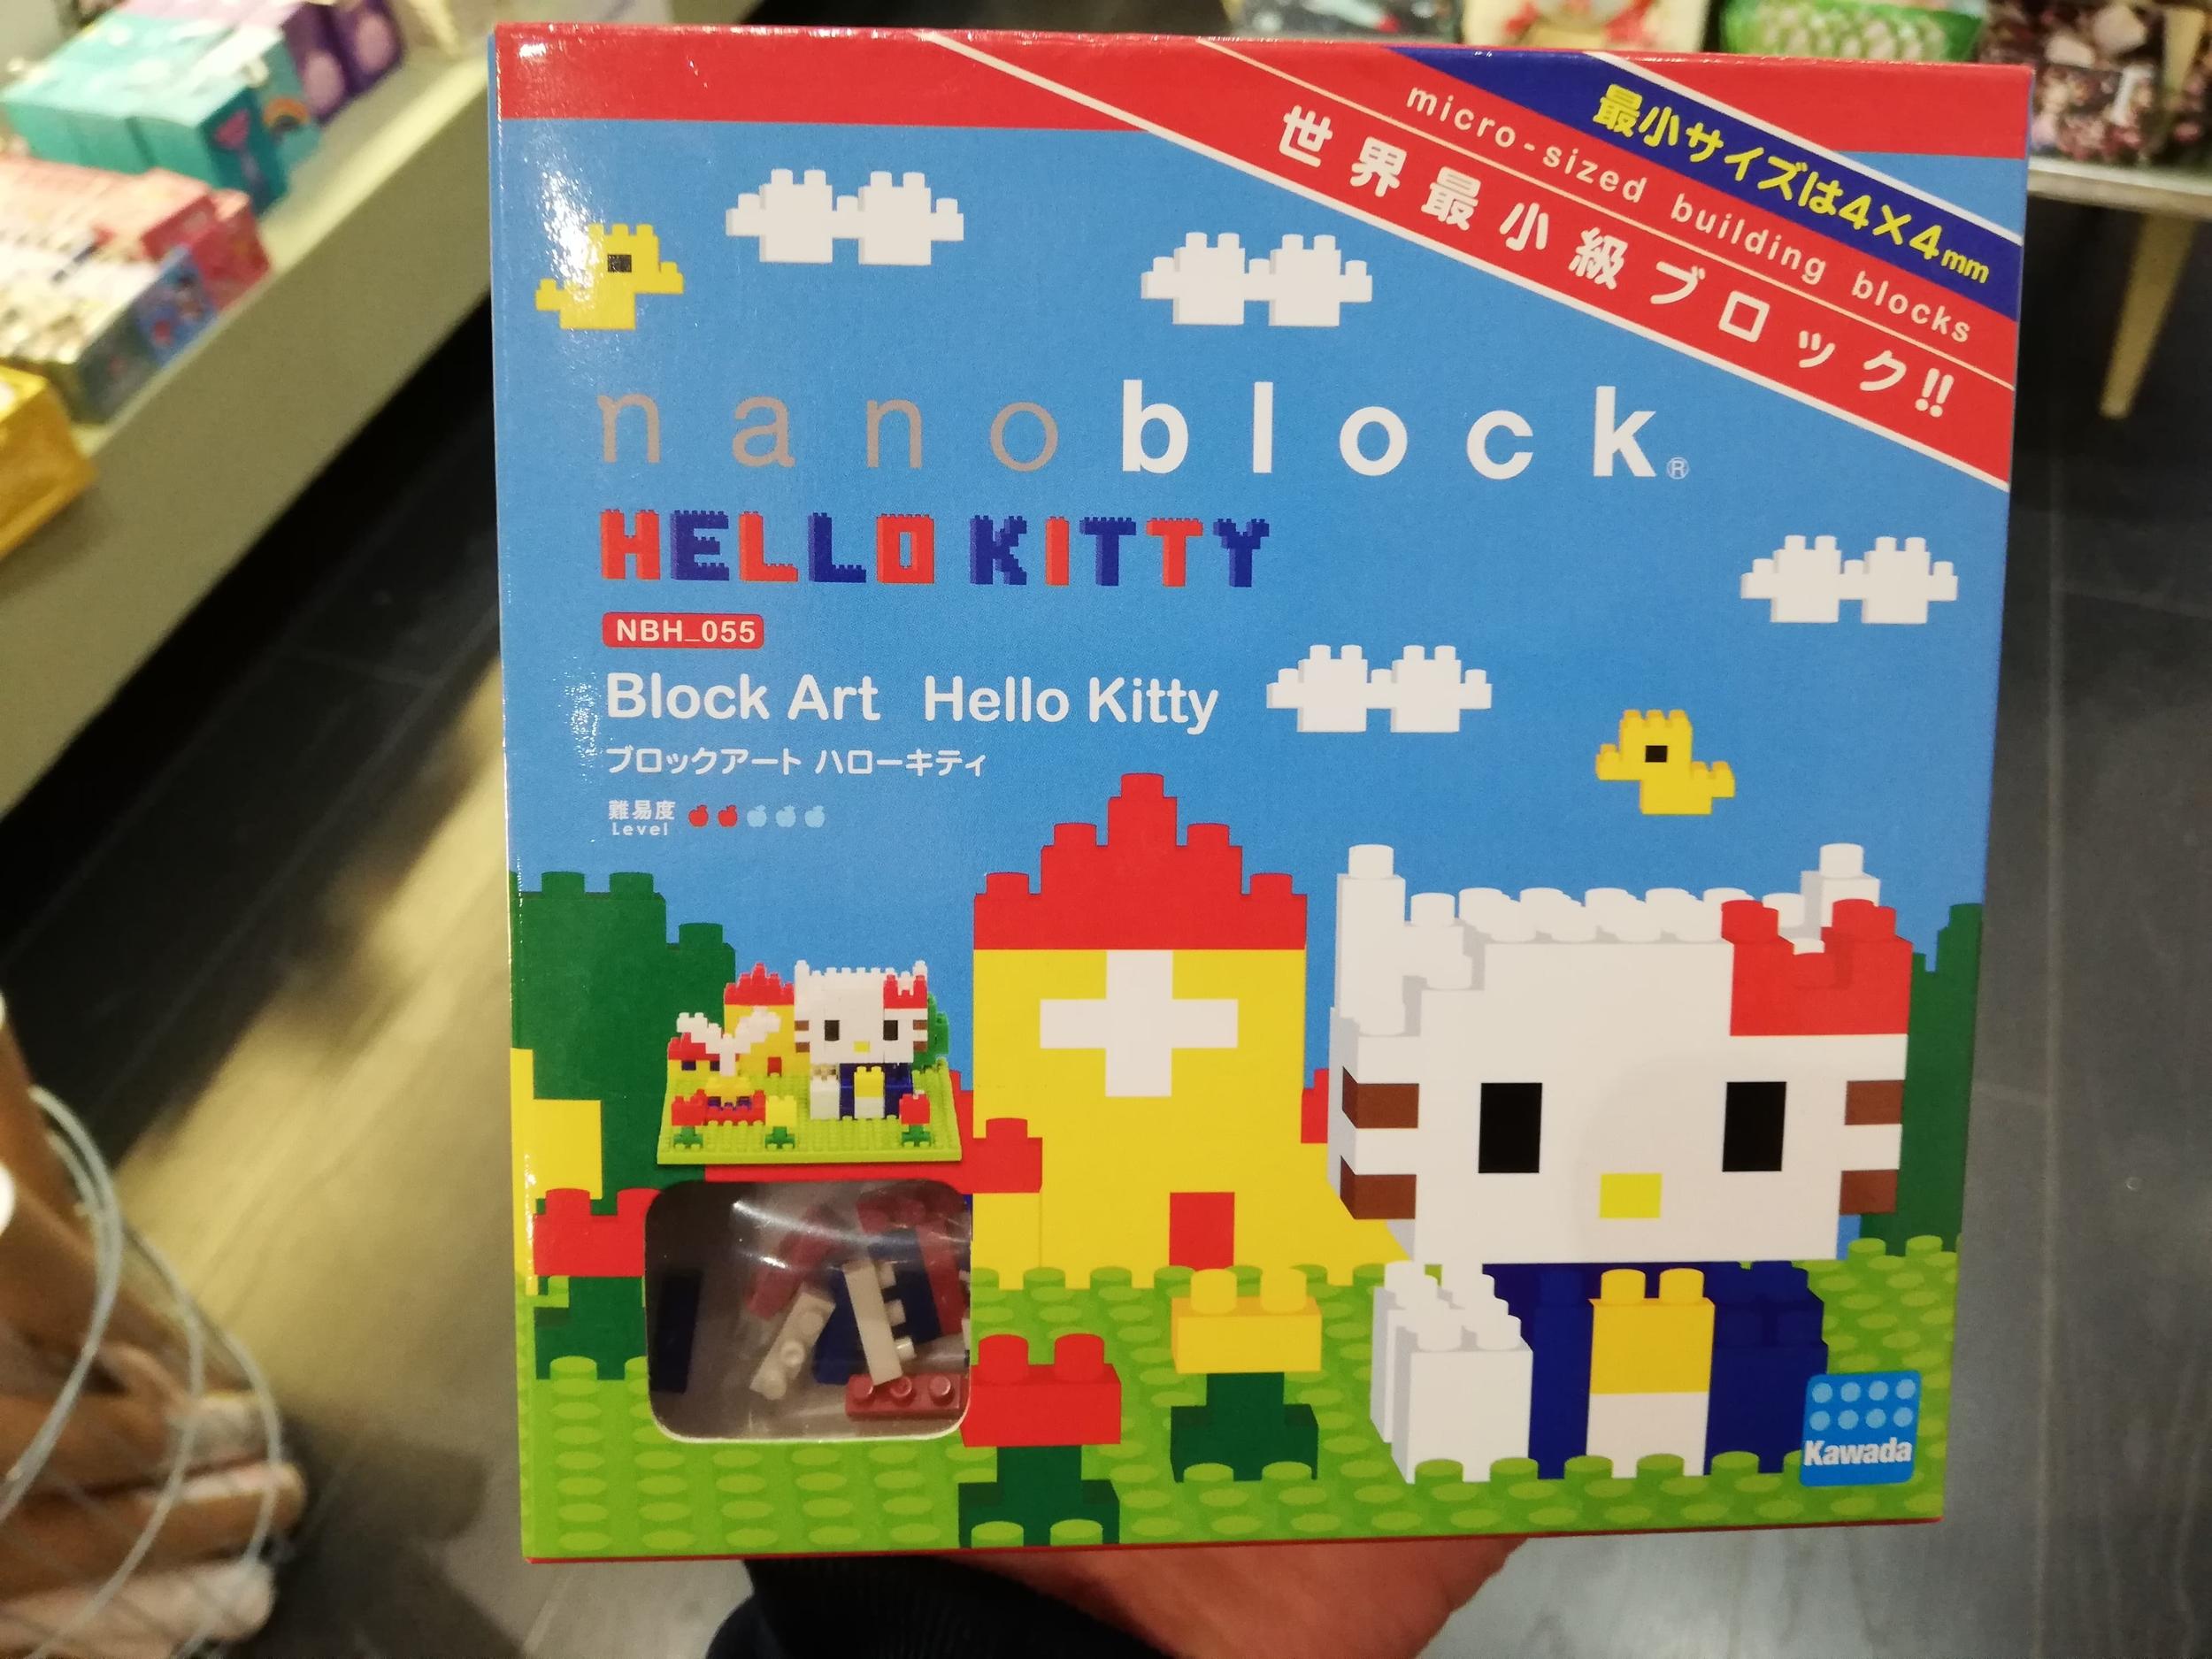 hello-kitty-valenciennes-petit-d-homme-nanoblock